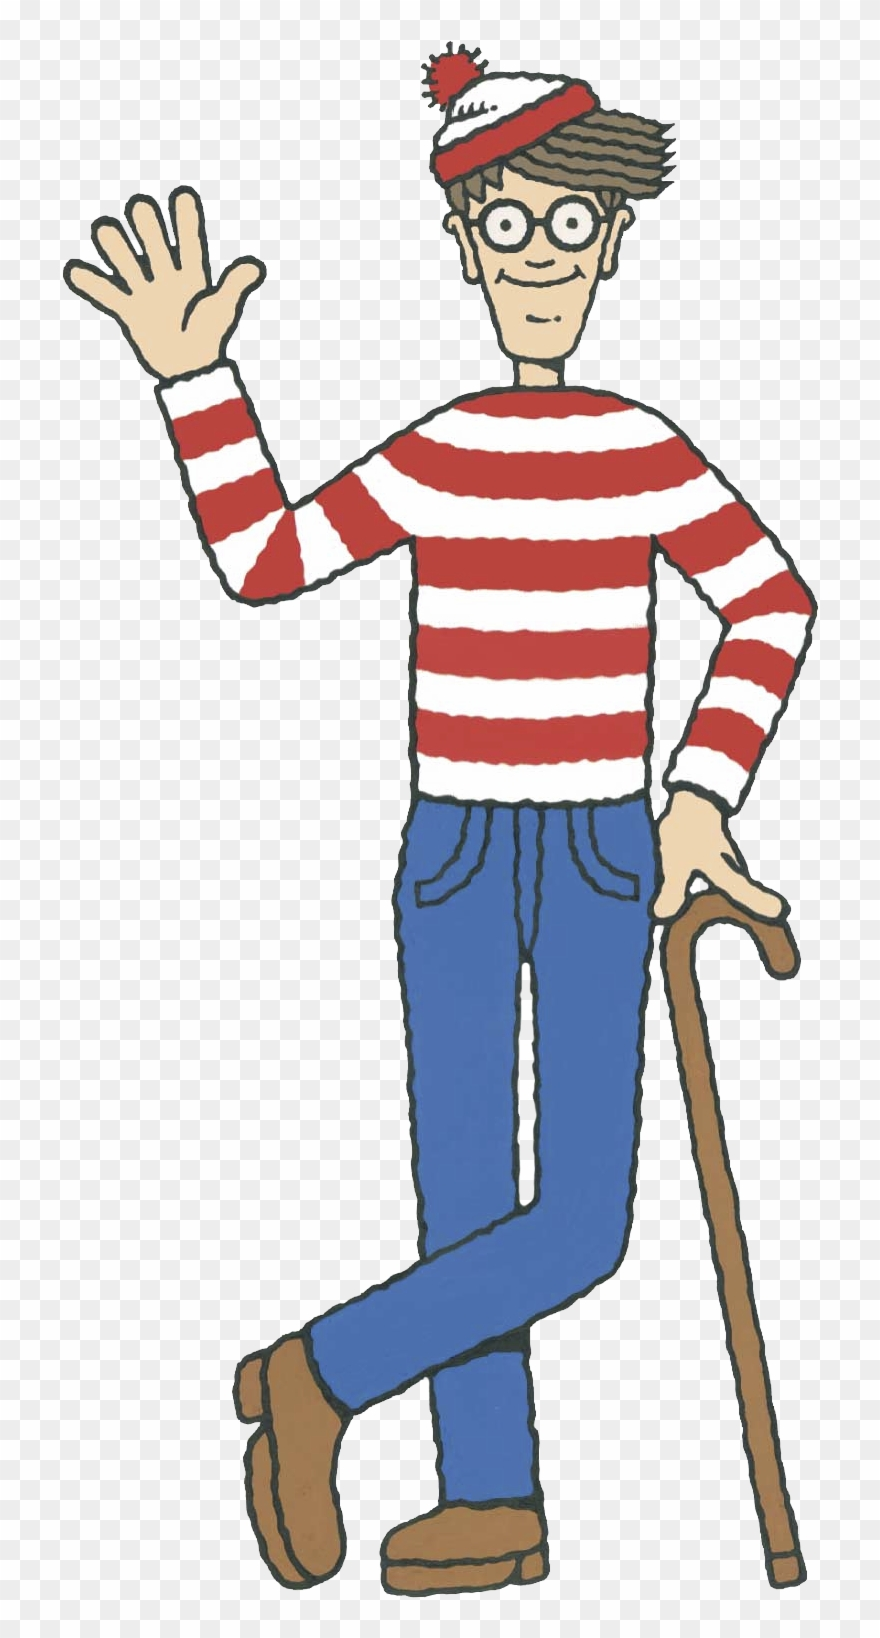 Waldo Clipart.